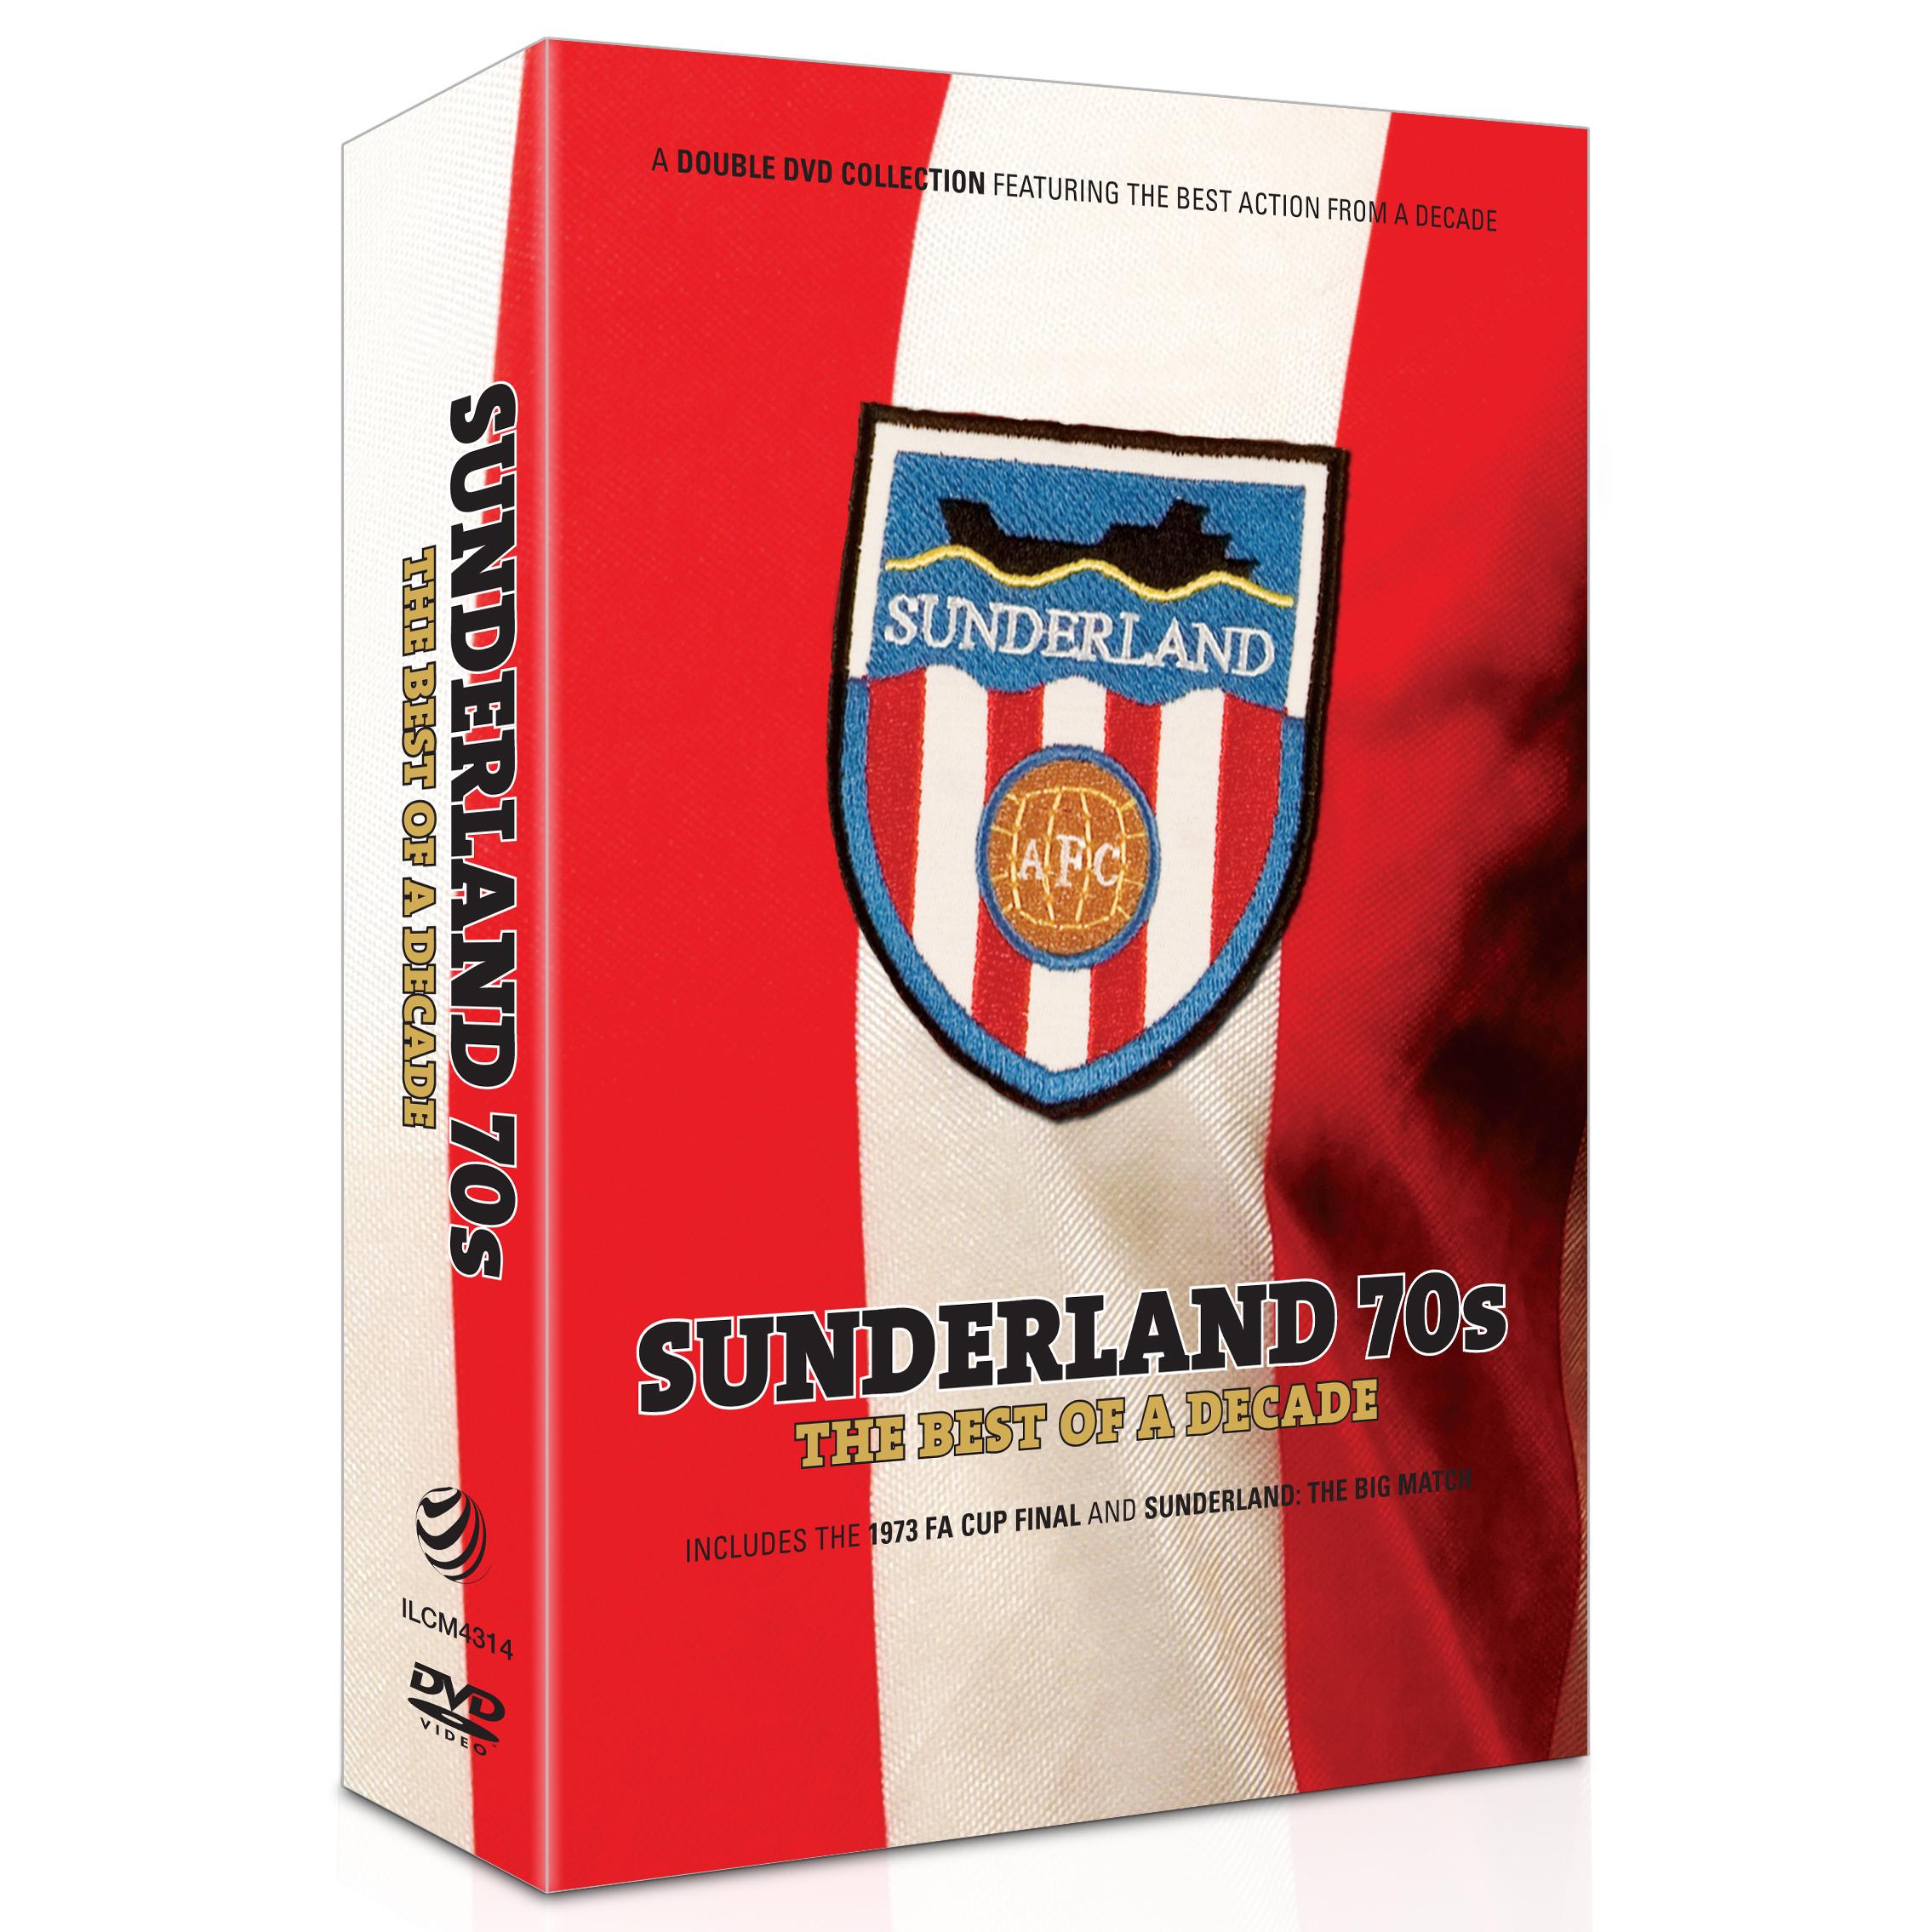 Sunderland The Best of a Decade DVD Boxset